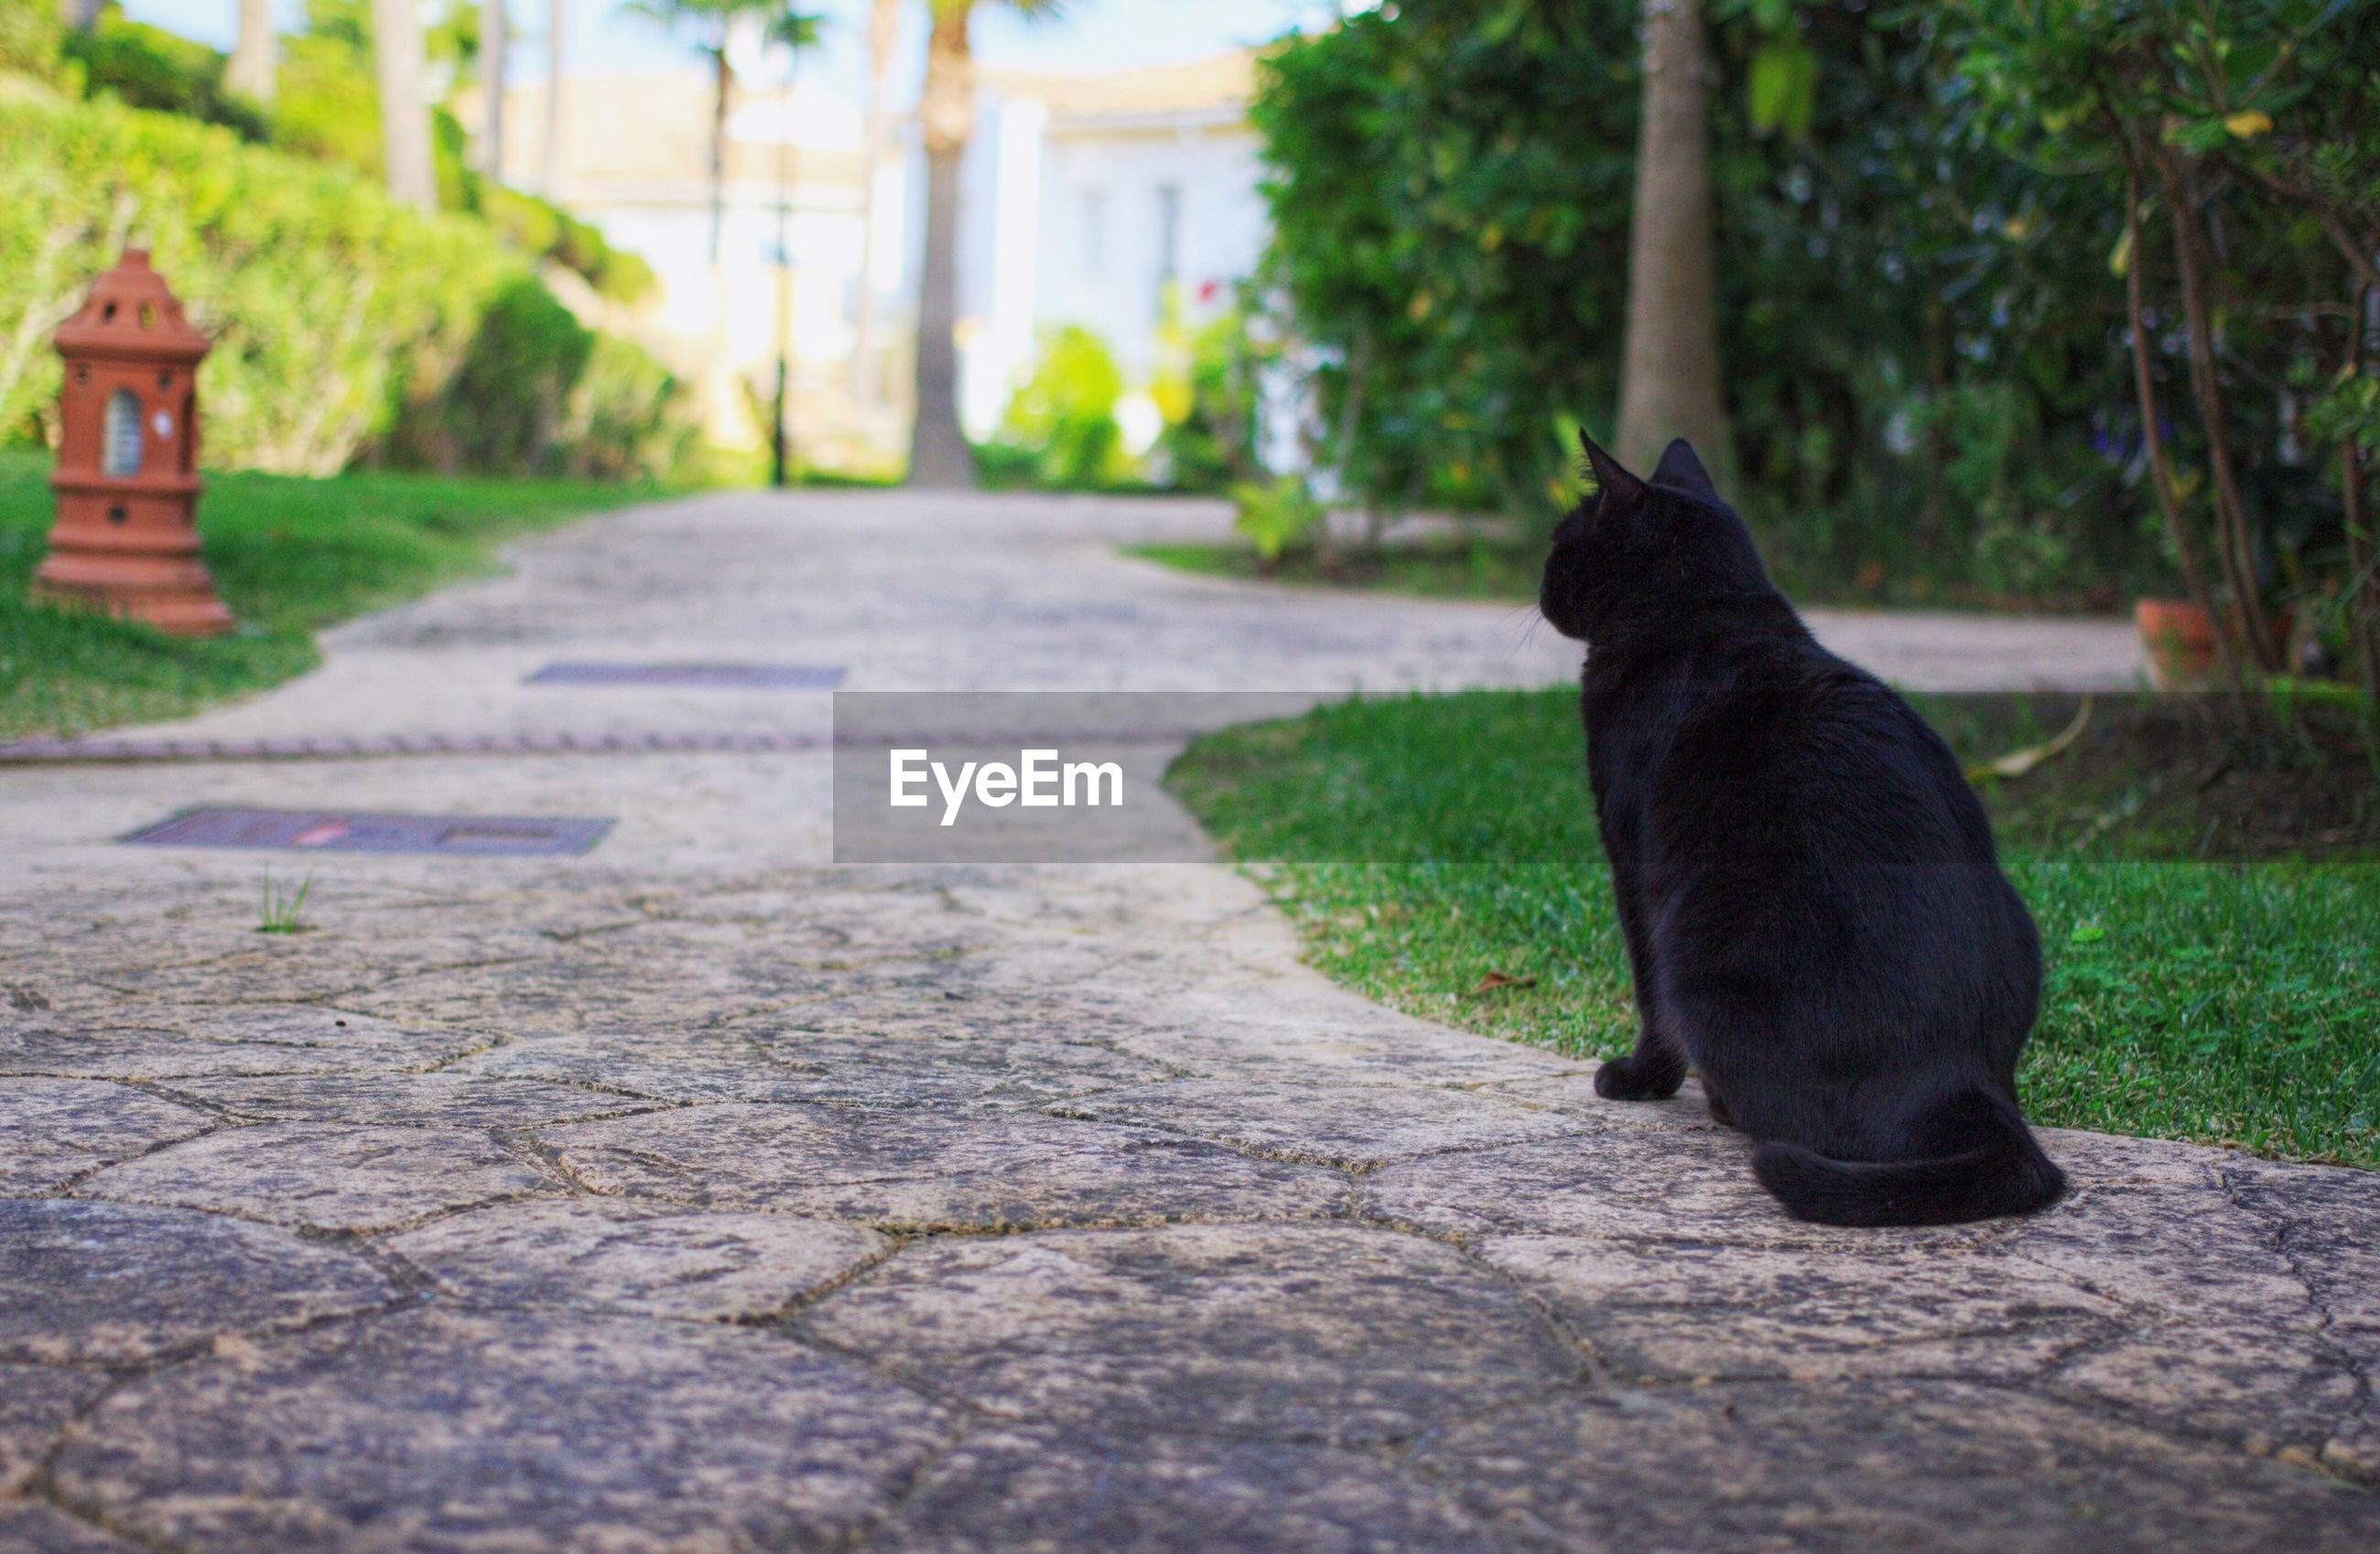 BLACK DOG STANDING ON STREET